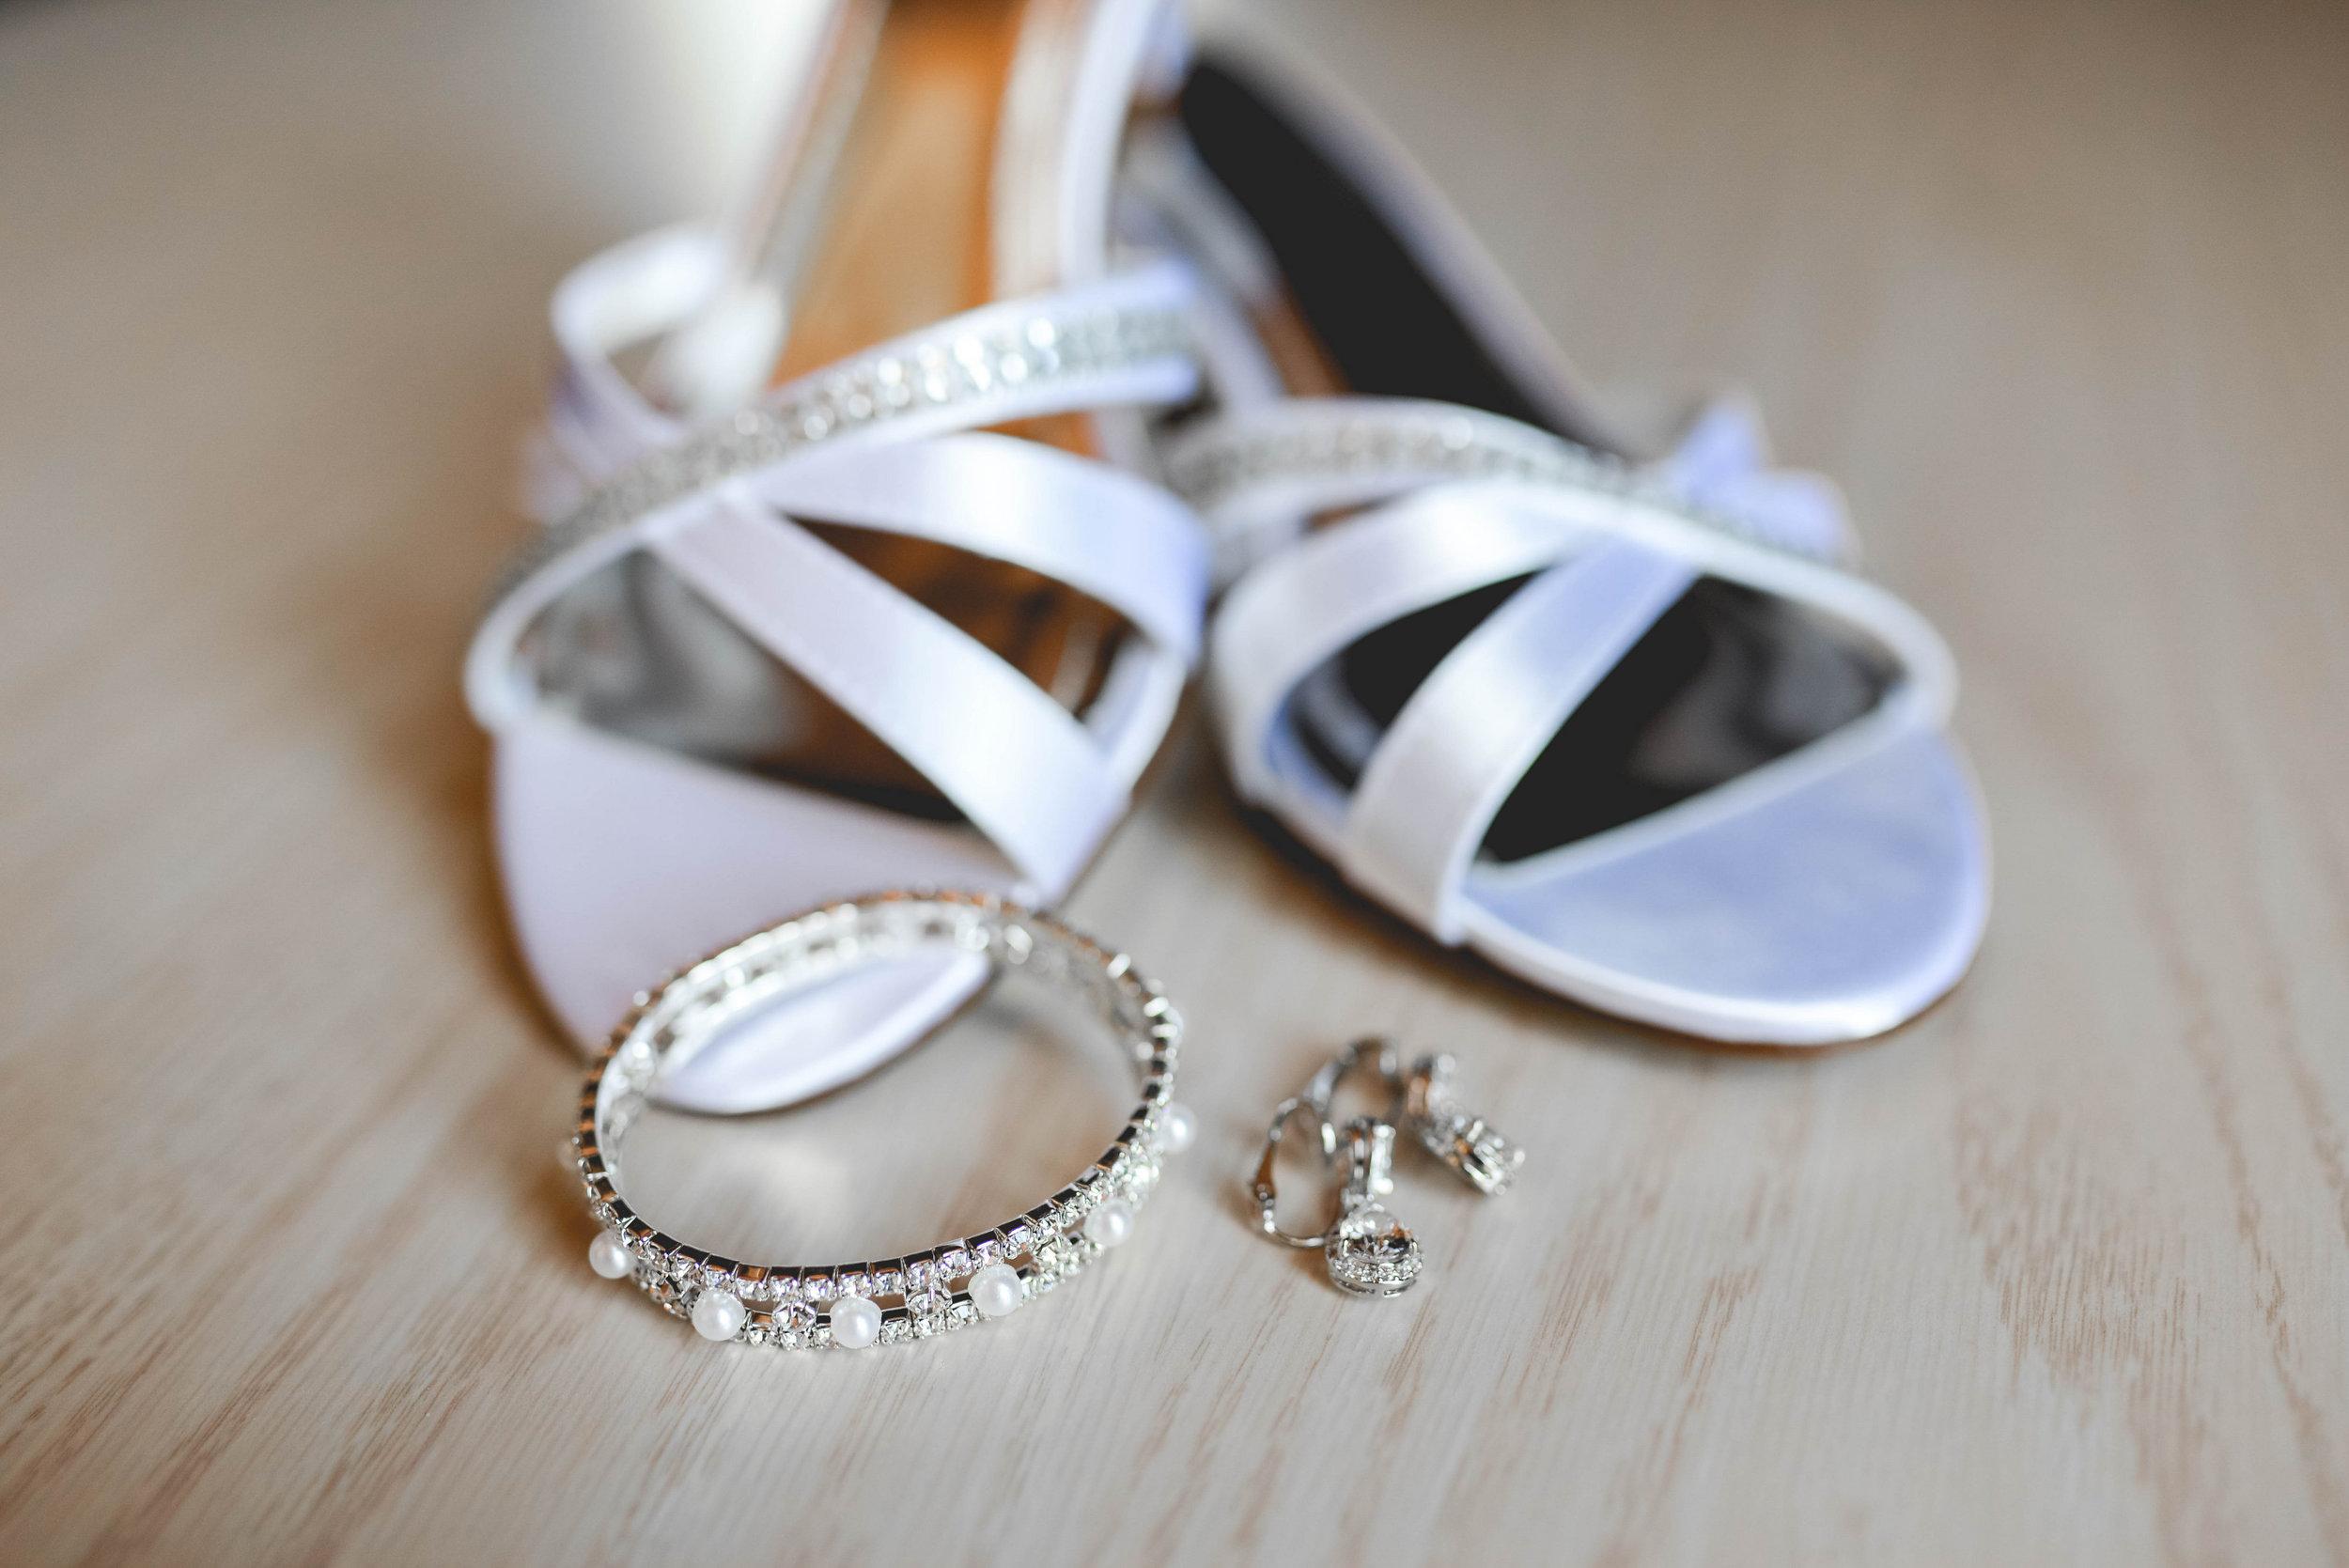 Donelson Wedding-Donelson-0019.jpg